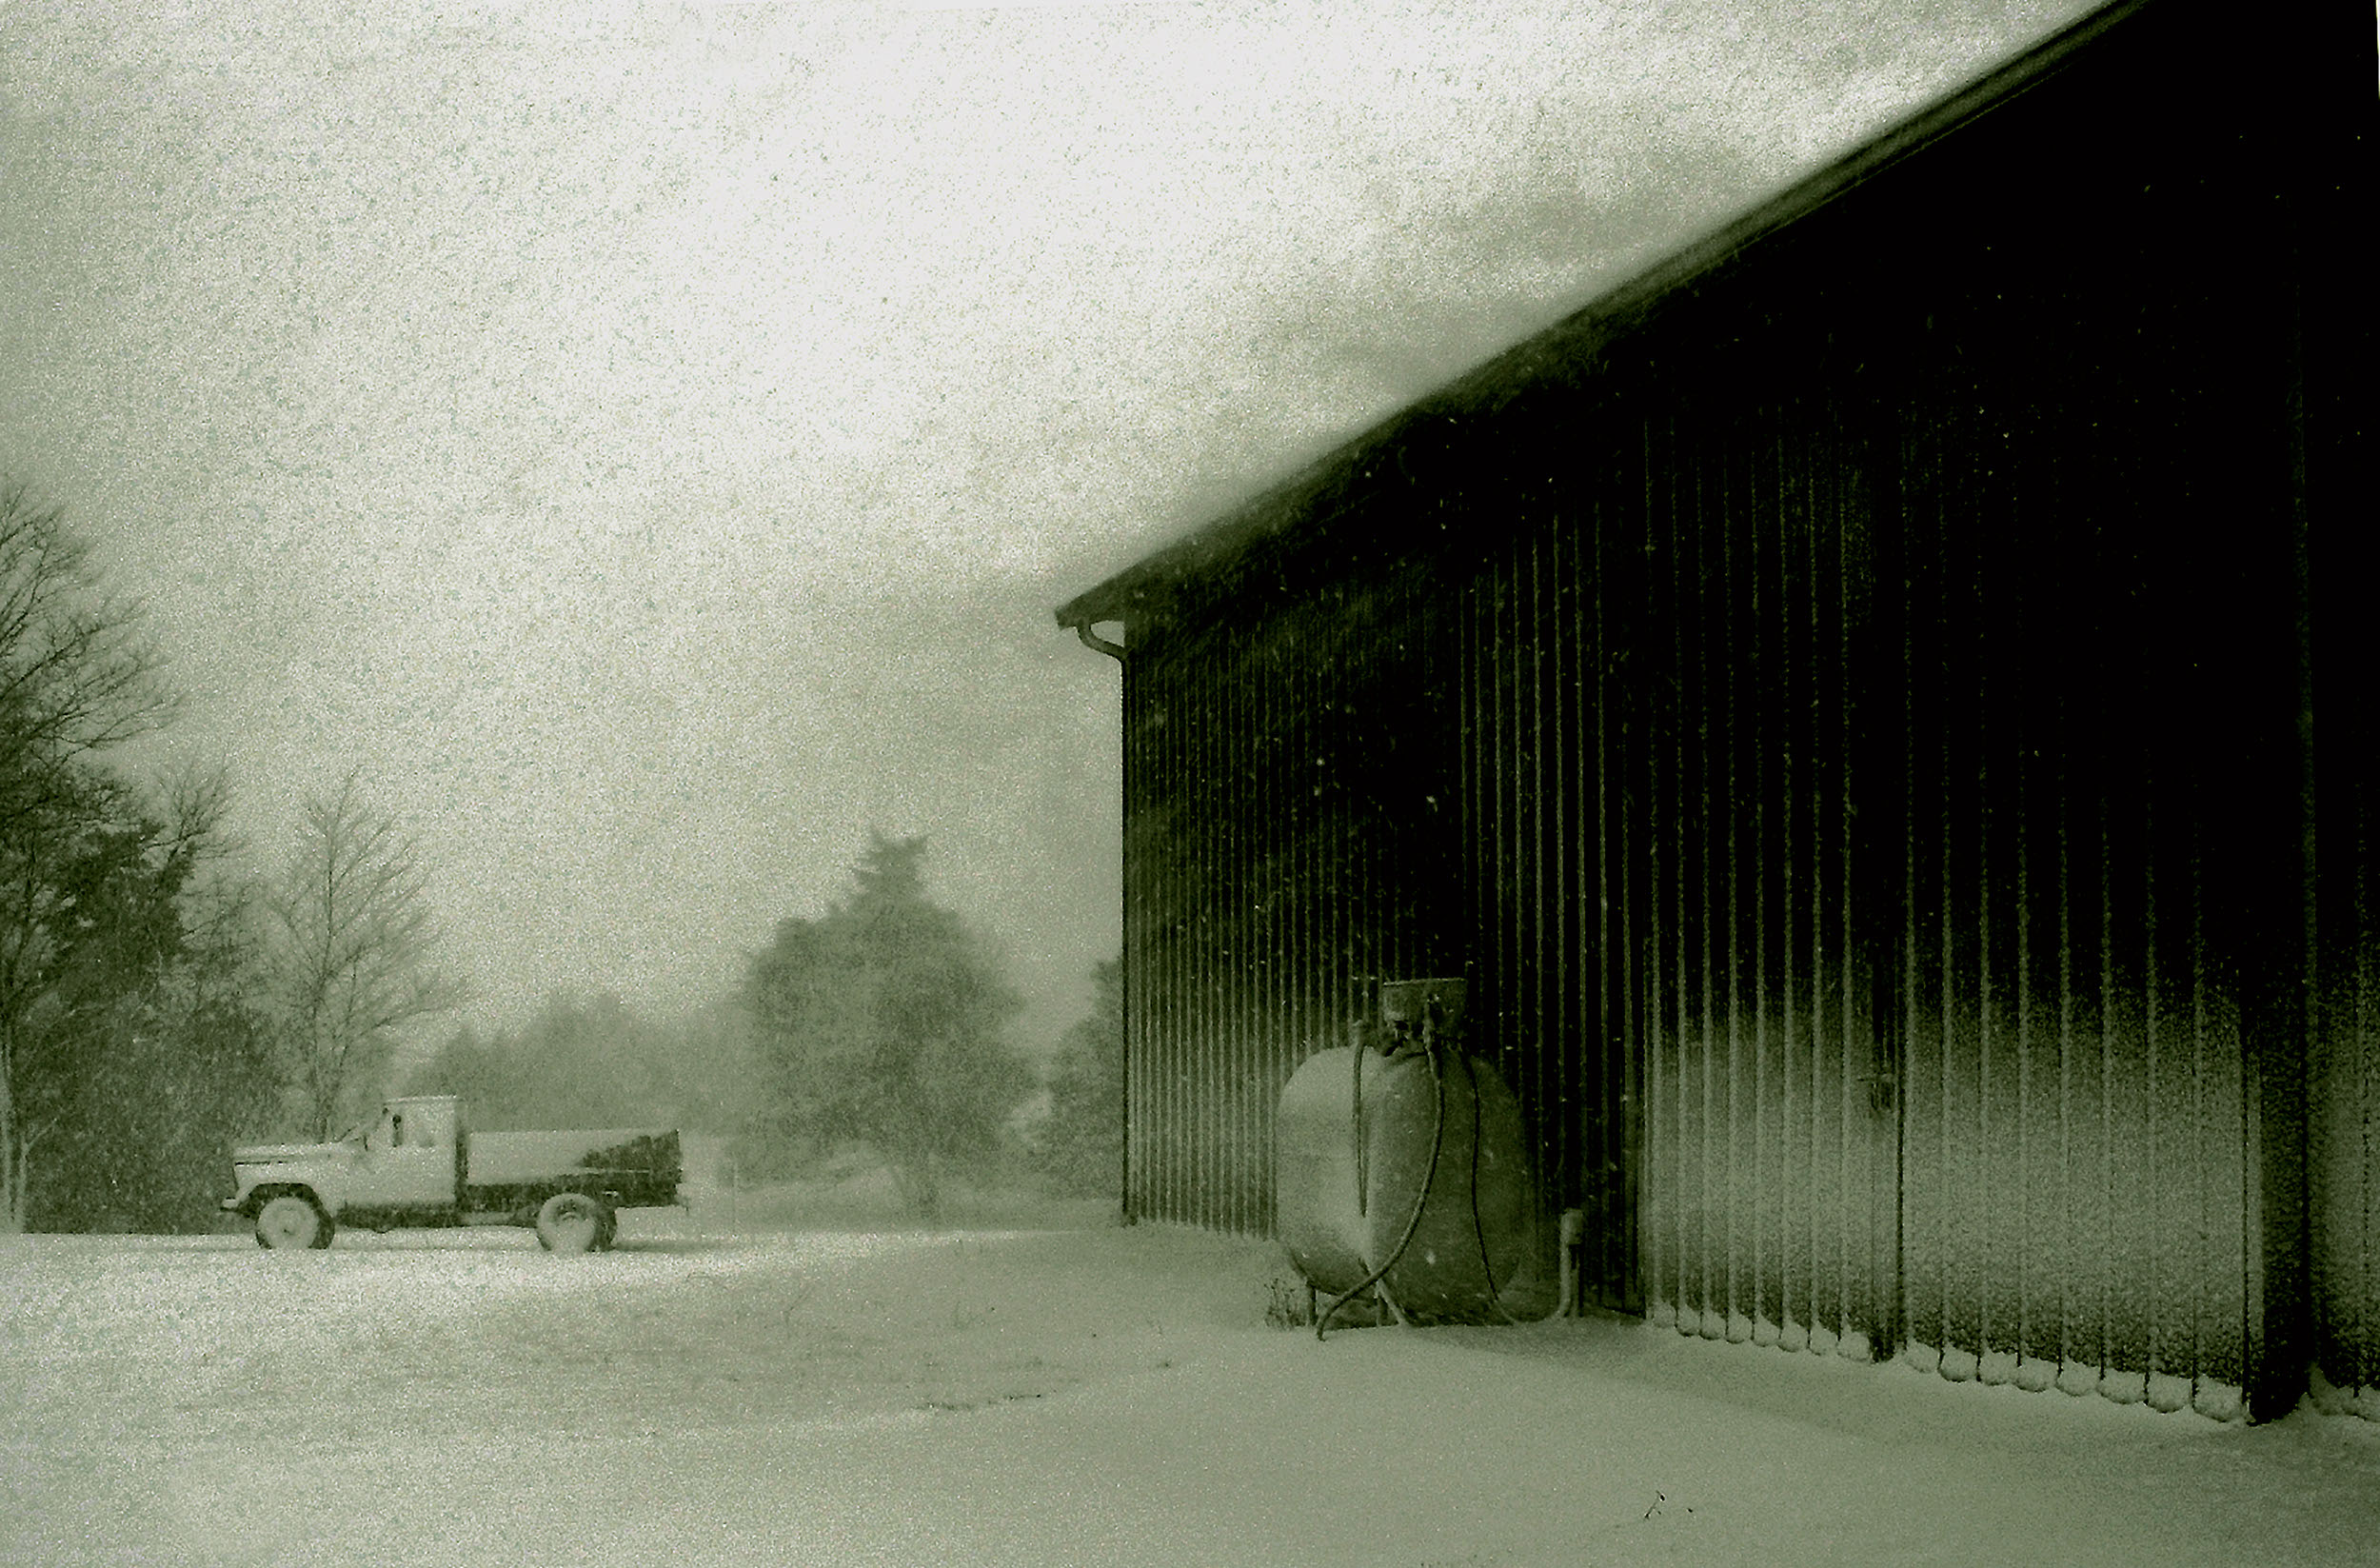 08_1025-Farm Building & Pickup w copy.jpg